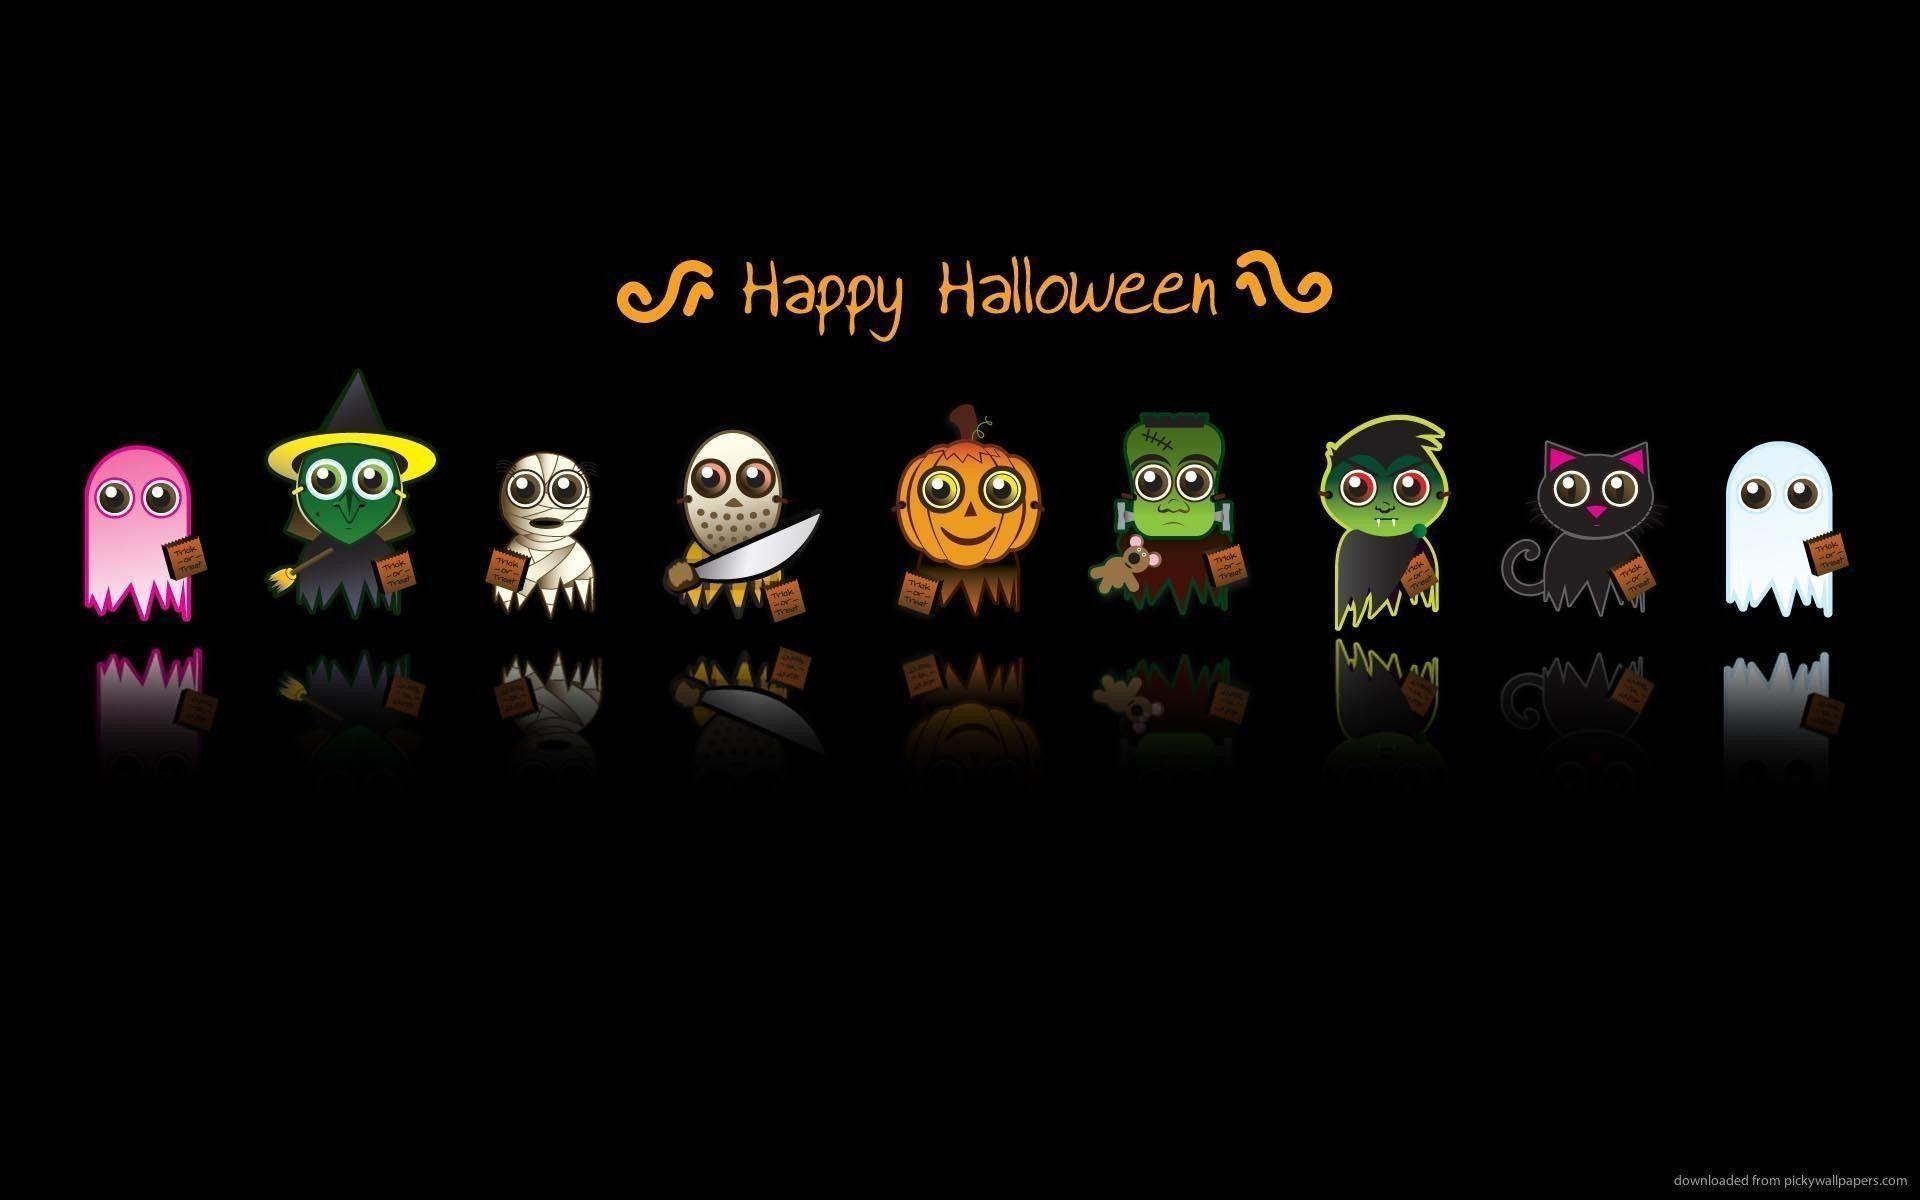 Wonderful Wallpaper Halloween Windows 7 - 497058-widescreen-cute-halloween-desktop-wallpaper-1920x1200-windows-7  Graphic_481672.jpg